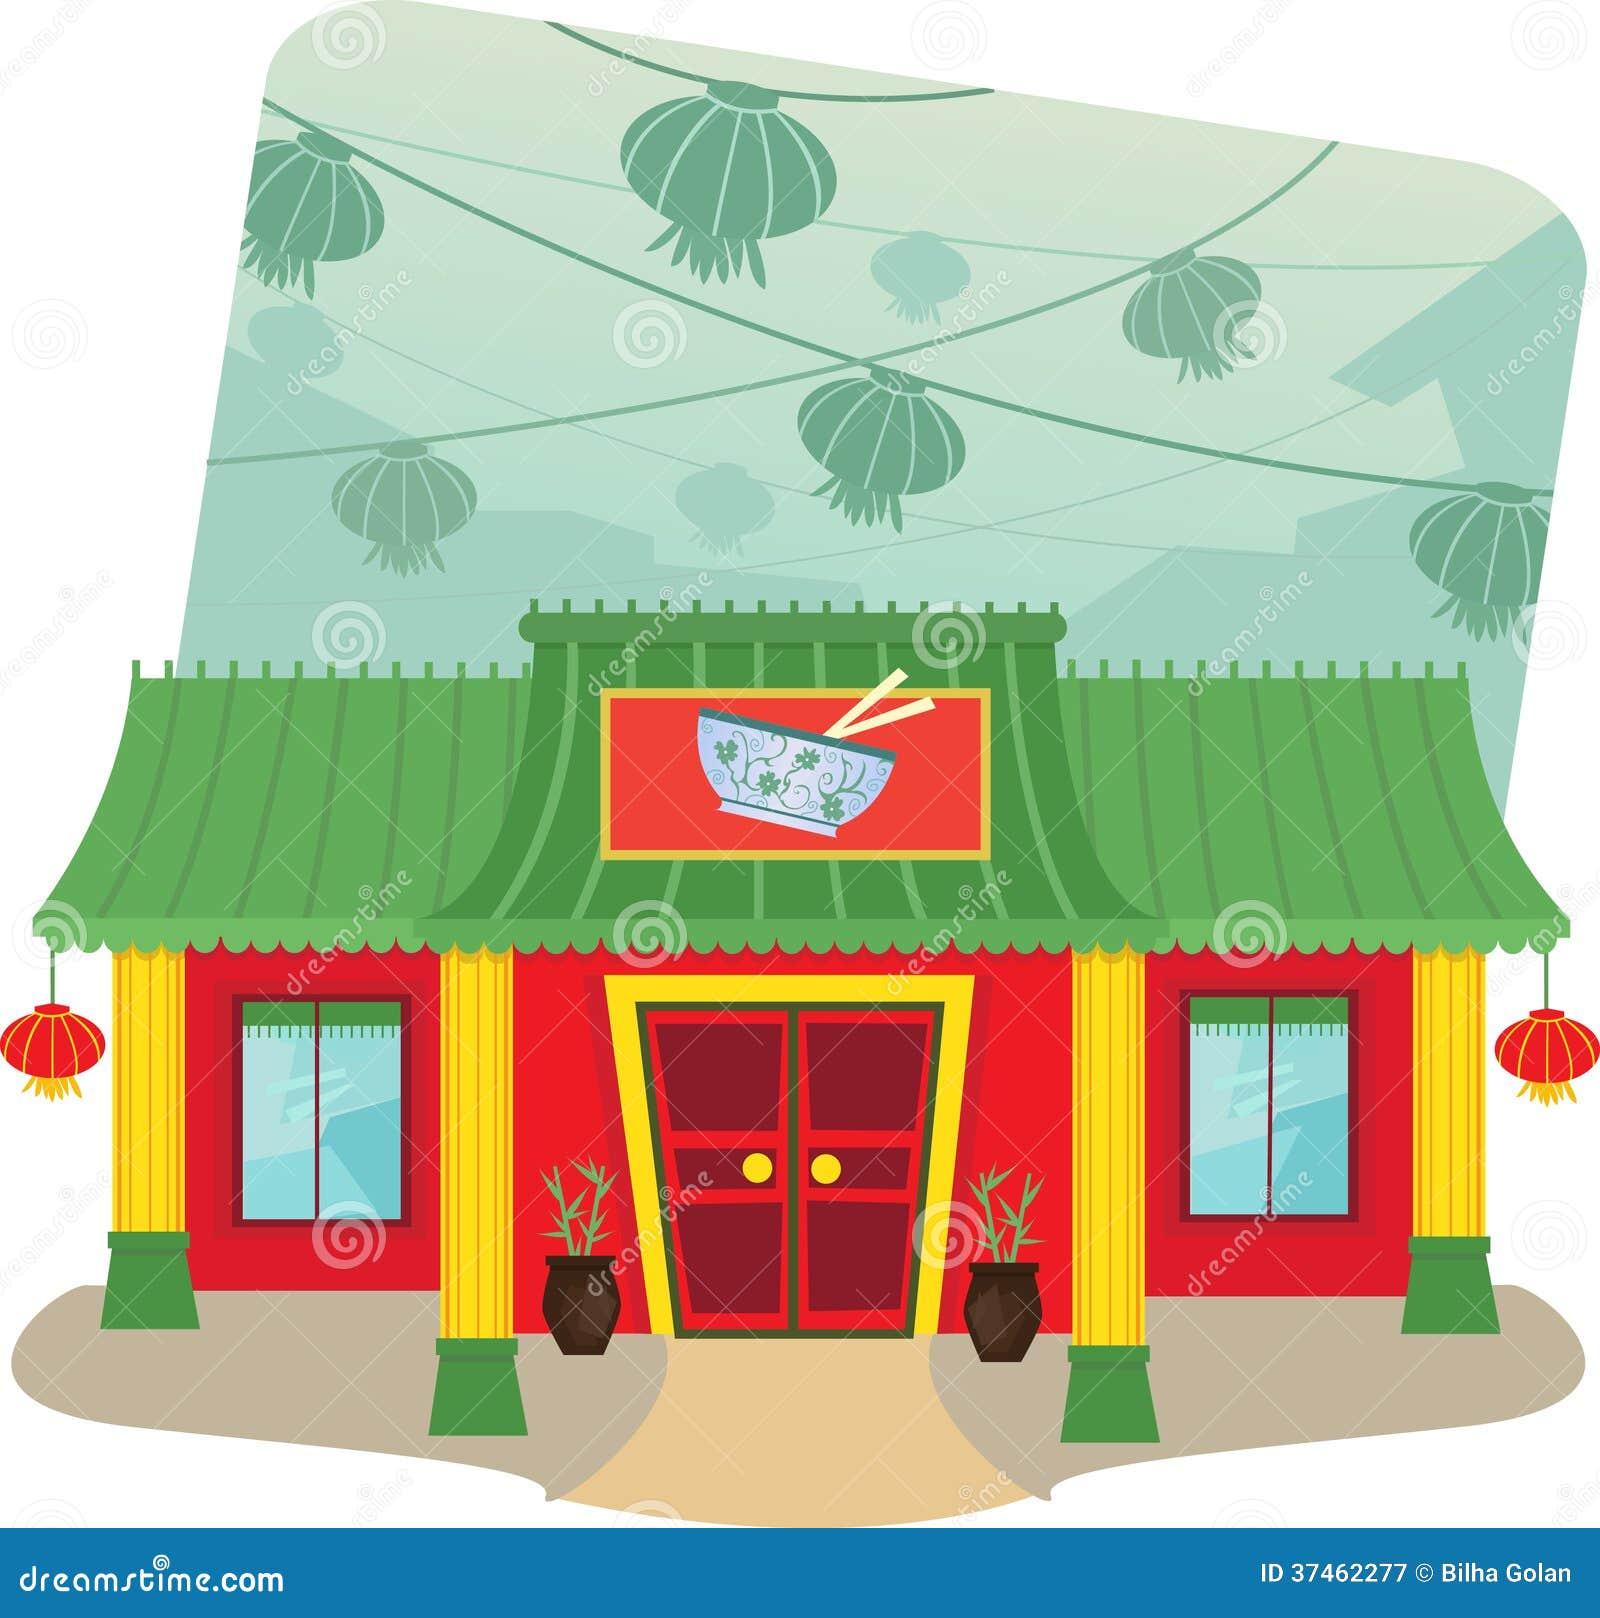 Building cartoon clipart restaurant building and restaurant building - Royalty Free Stock Photo Download Chinese Restaurant